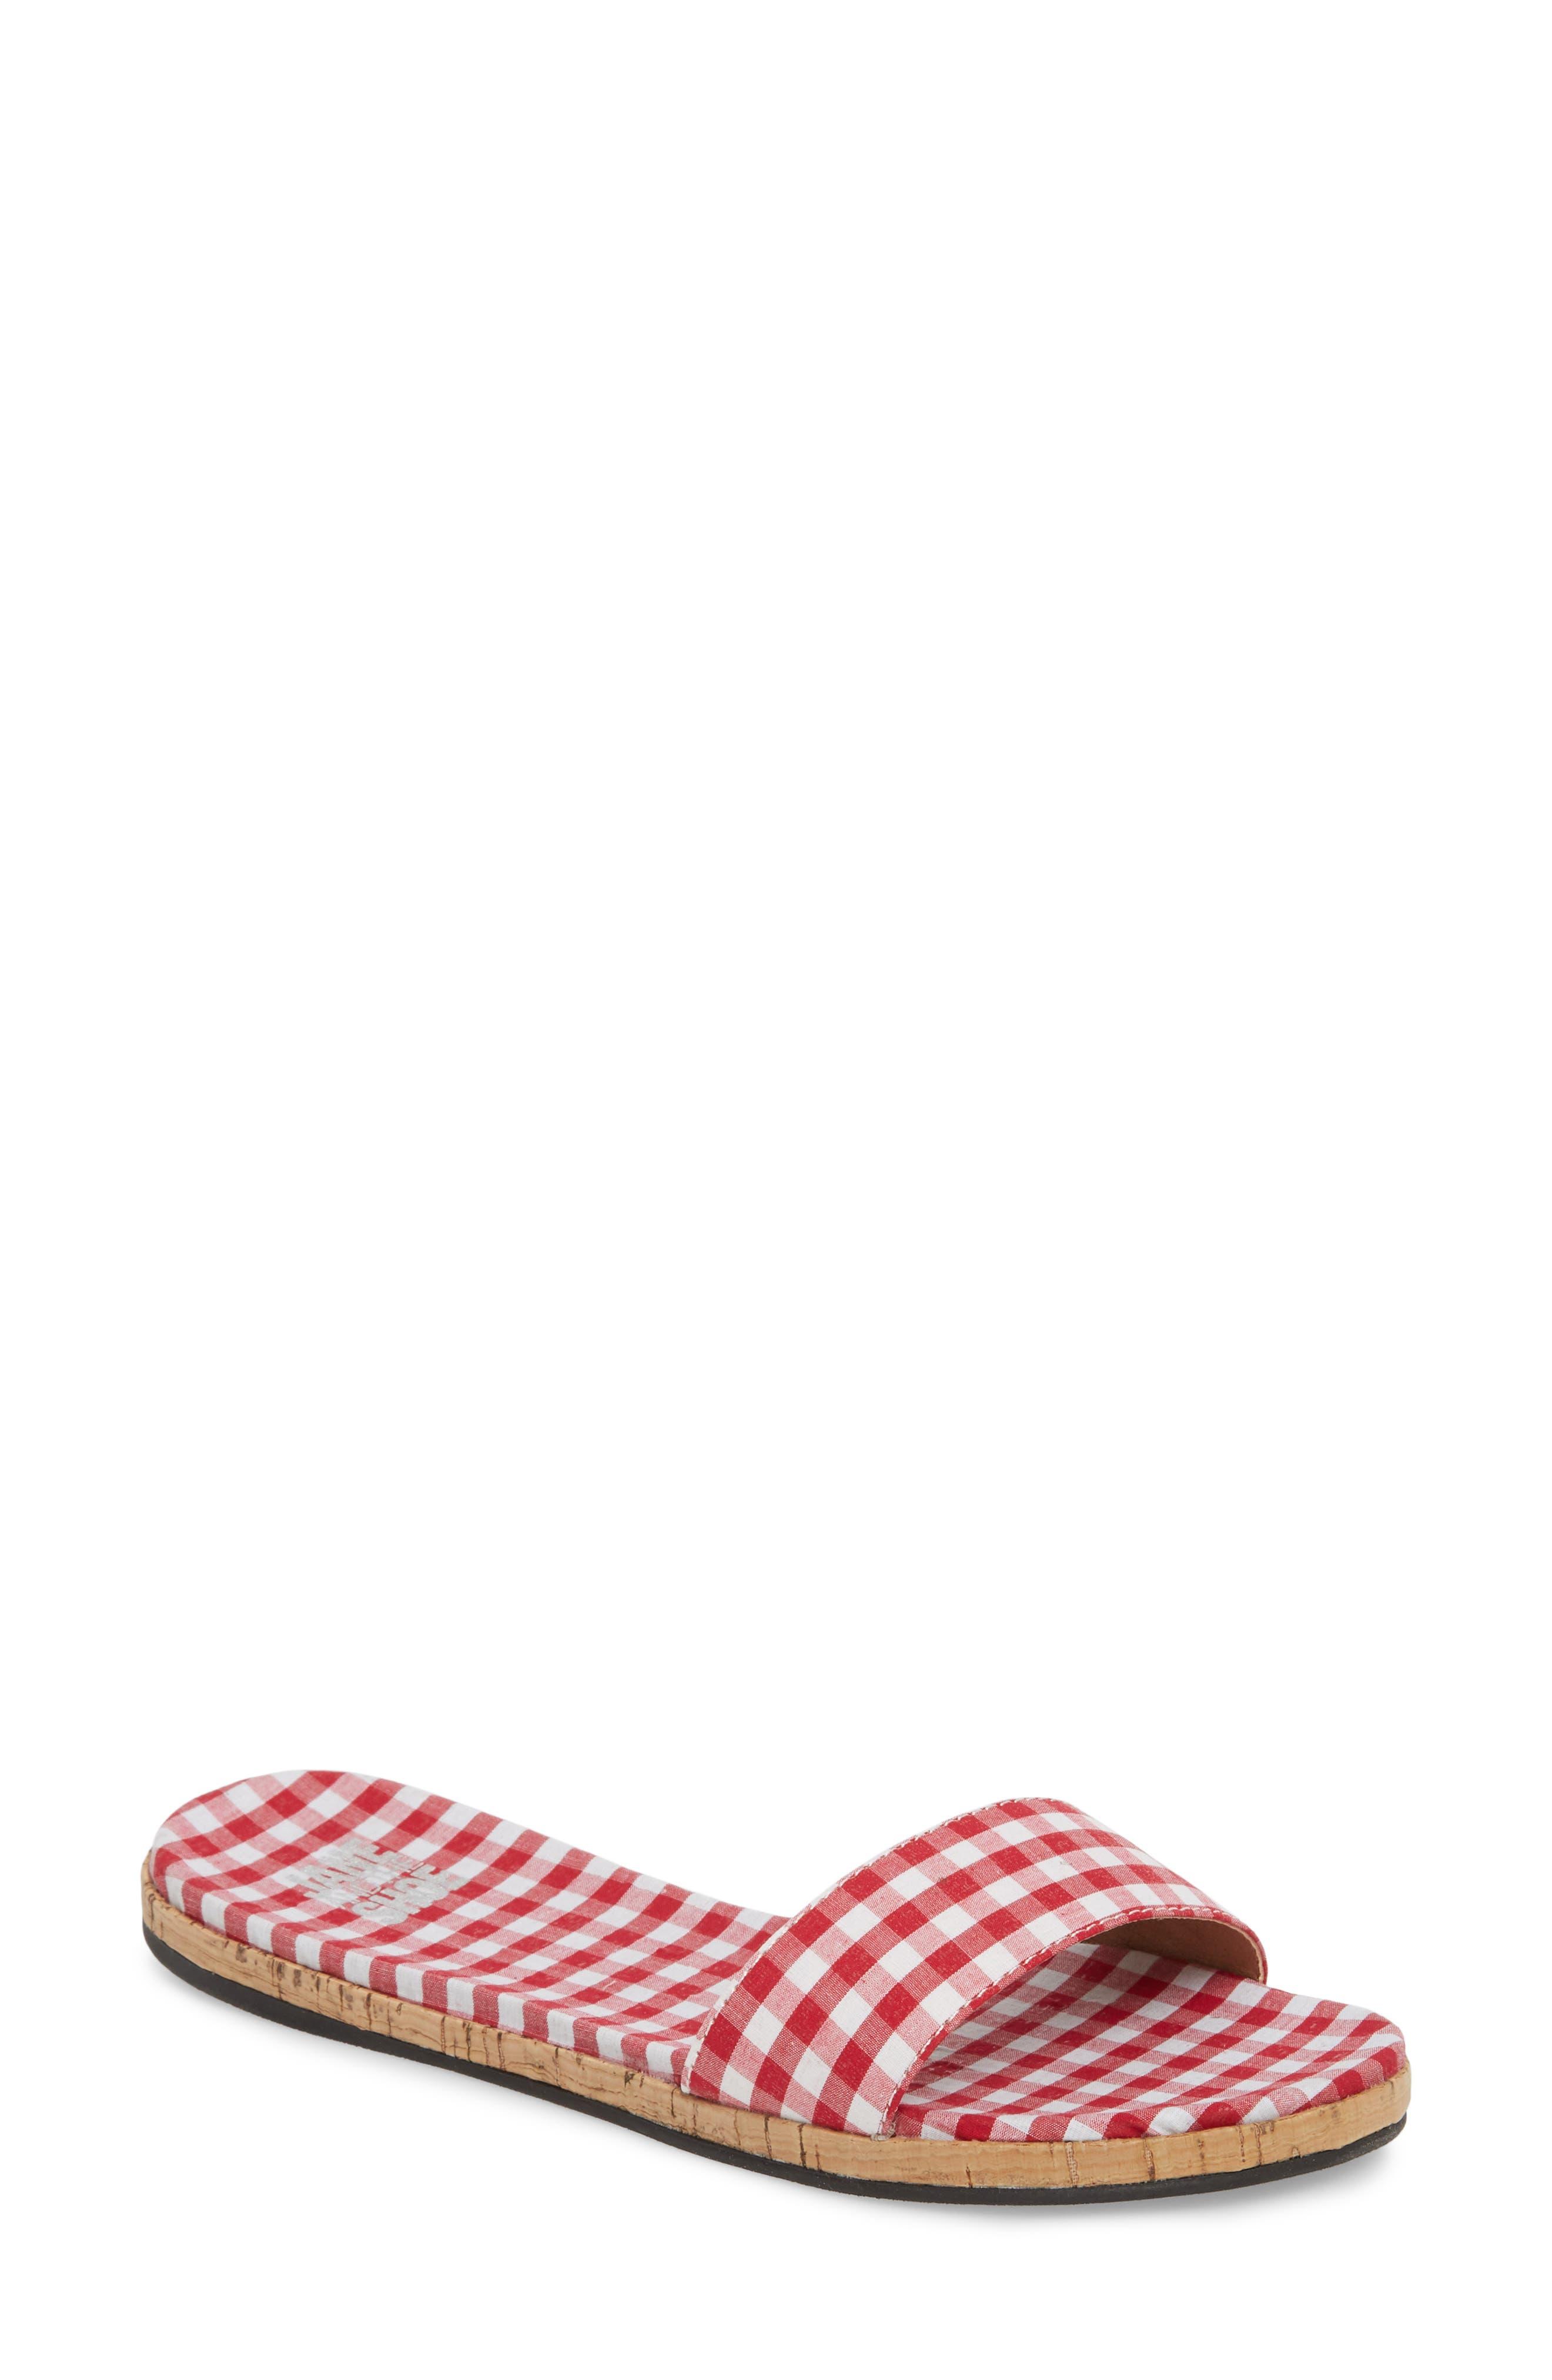 Jill Thin Band Slide Sandal,                         Main,                         color, Red Gingham